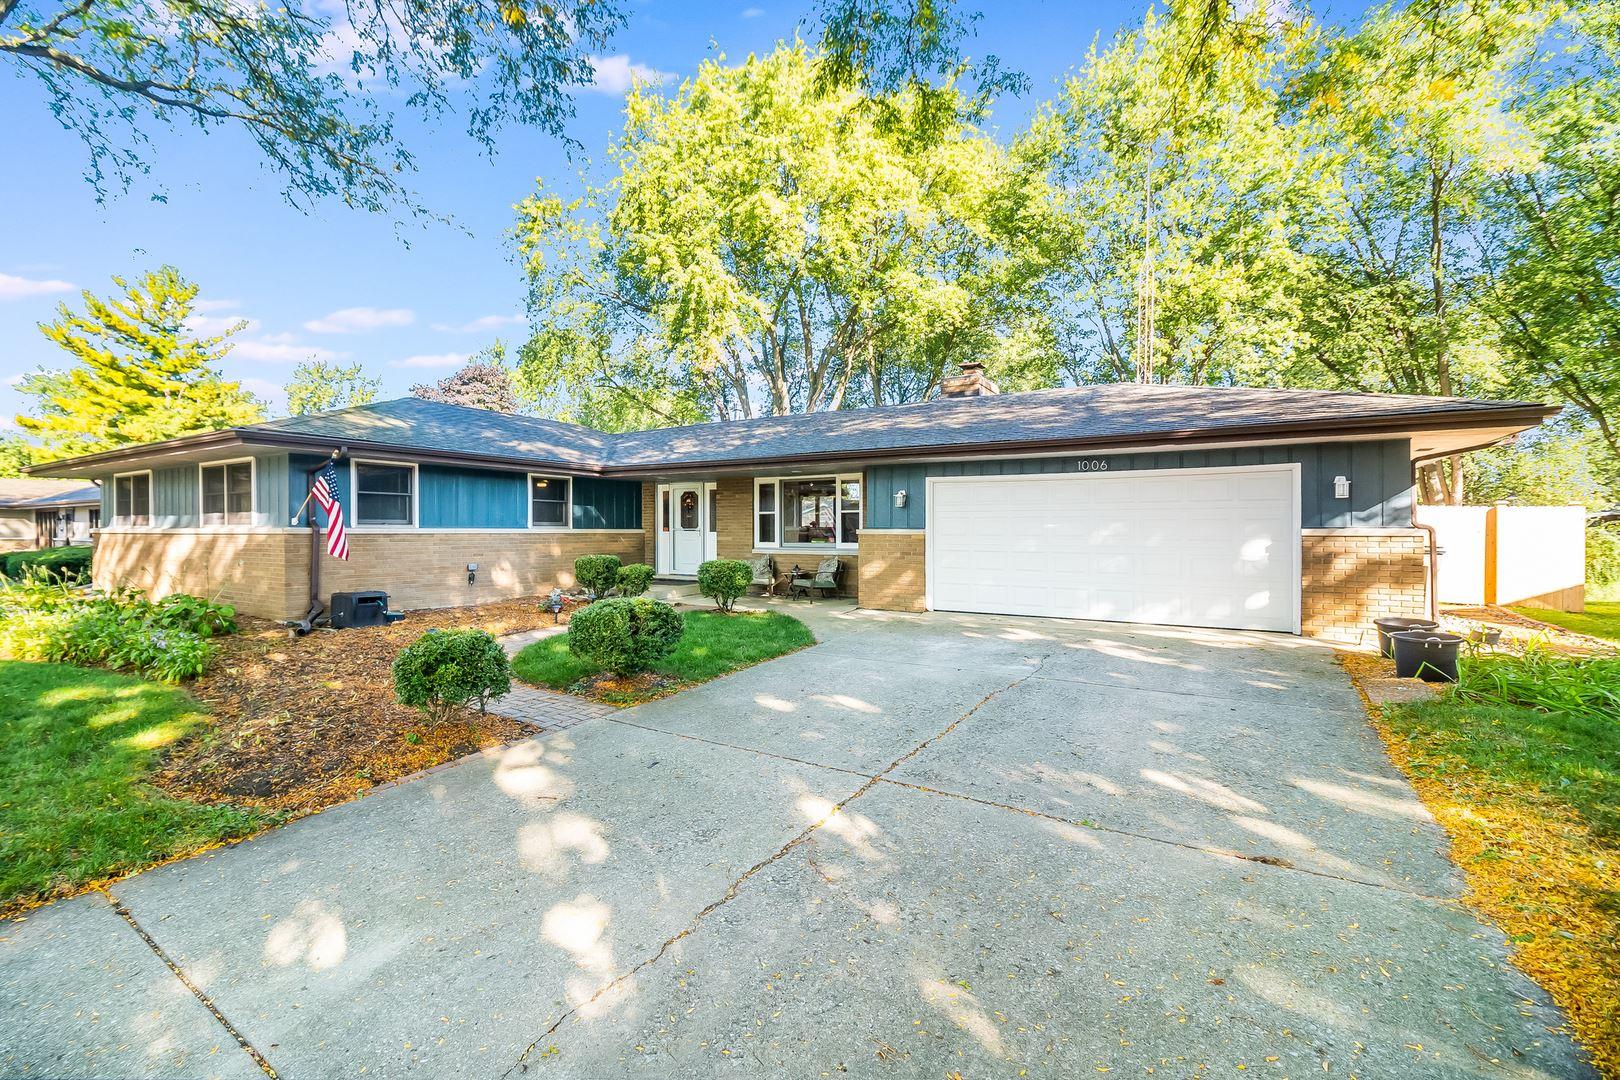 Photo of 1006 Lark Lane, Shorewood, IL 60404 (MLS # 10891319)